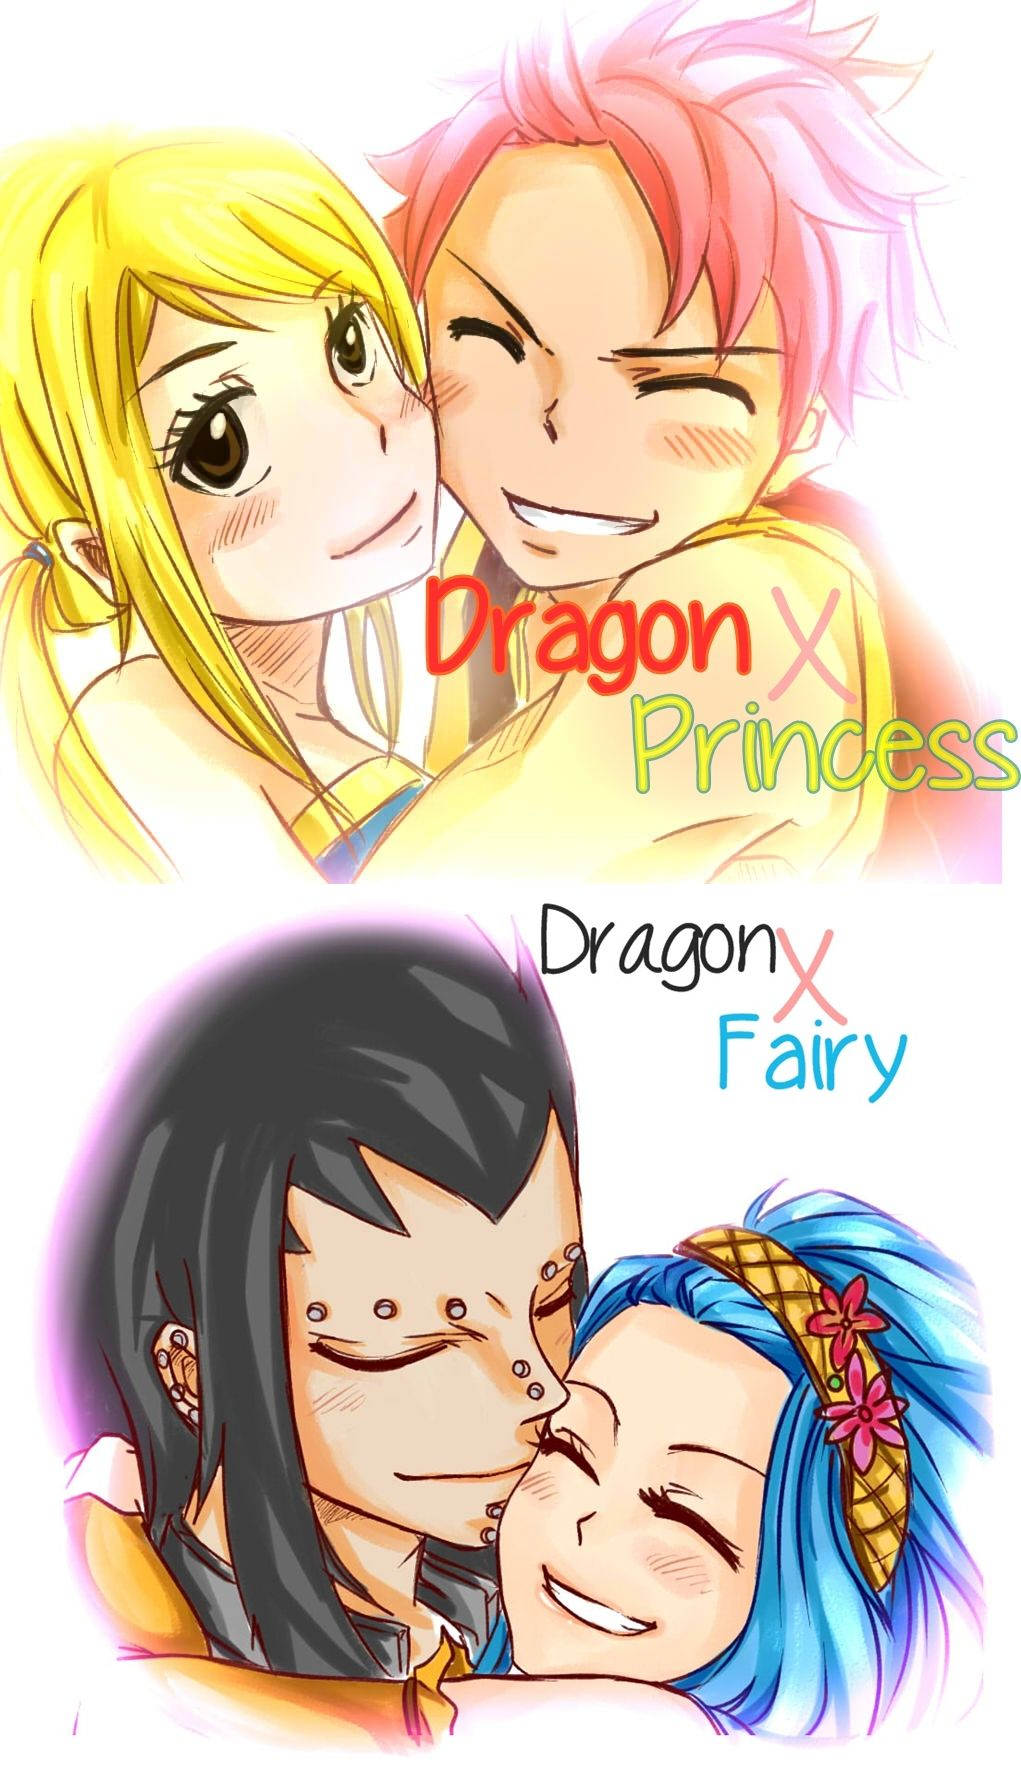 Dragon Slayers and their mates by black2sun2 deviantart com